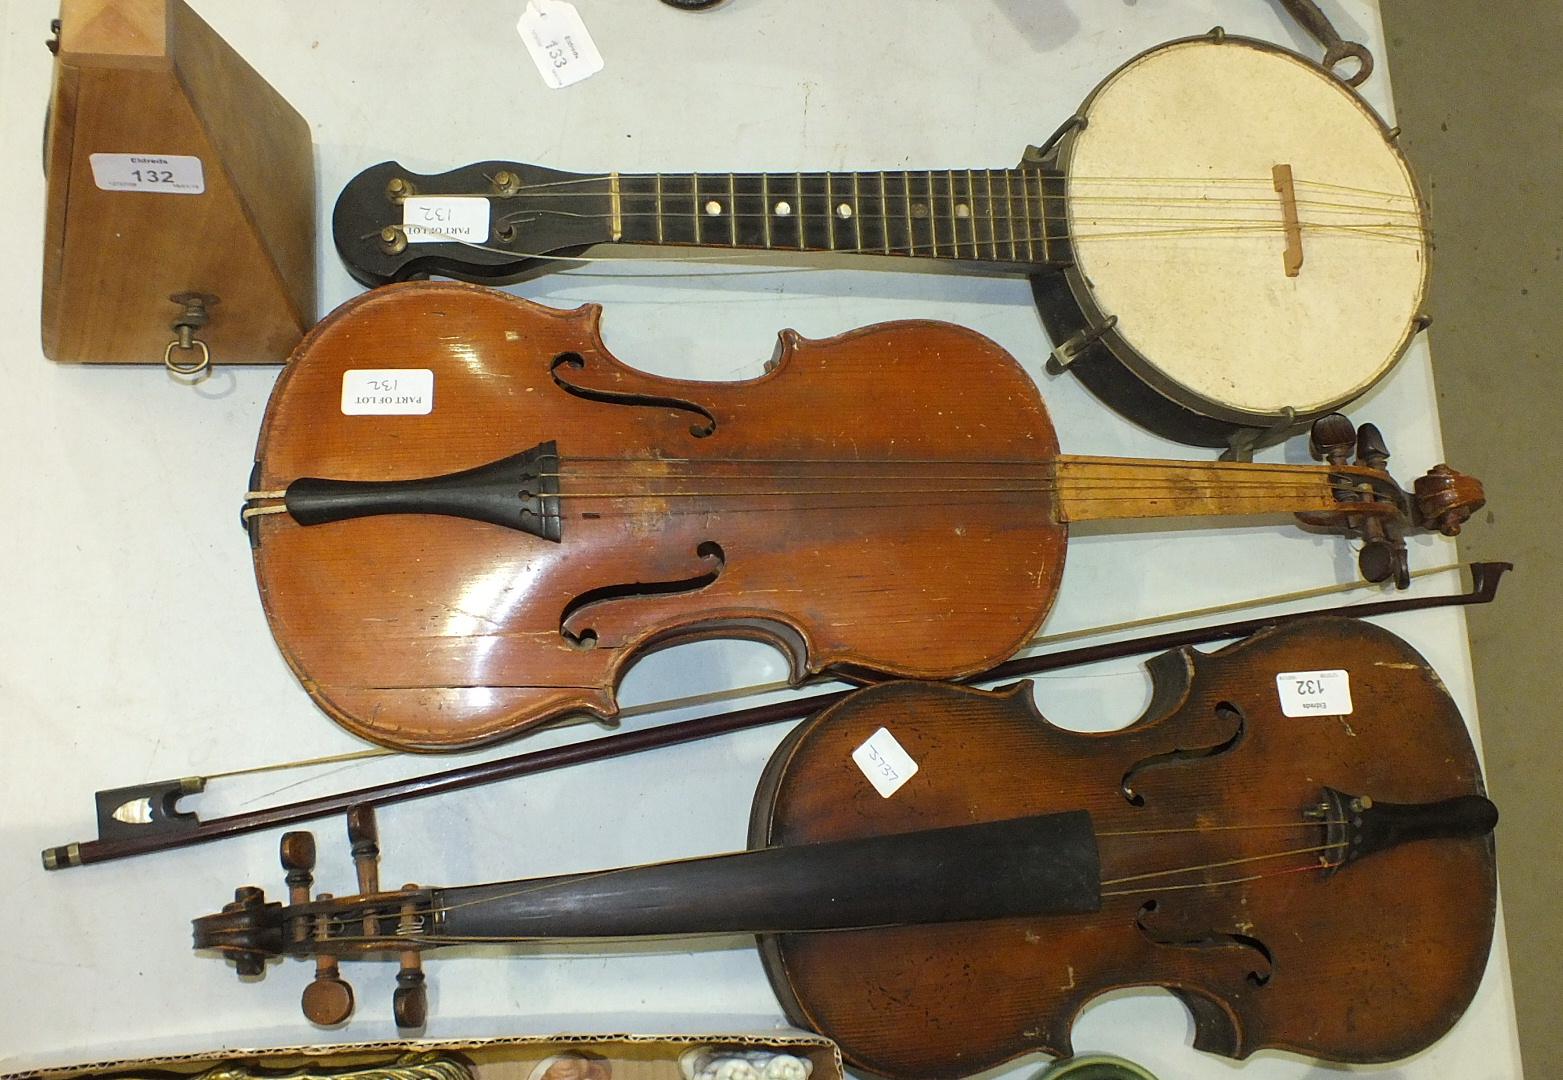 Lot 132 - A full-size violin with paper label, Apres Guarelagnini Lorengo, another violin, a bow, a small